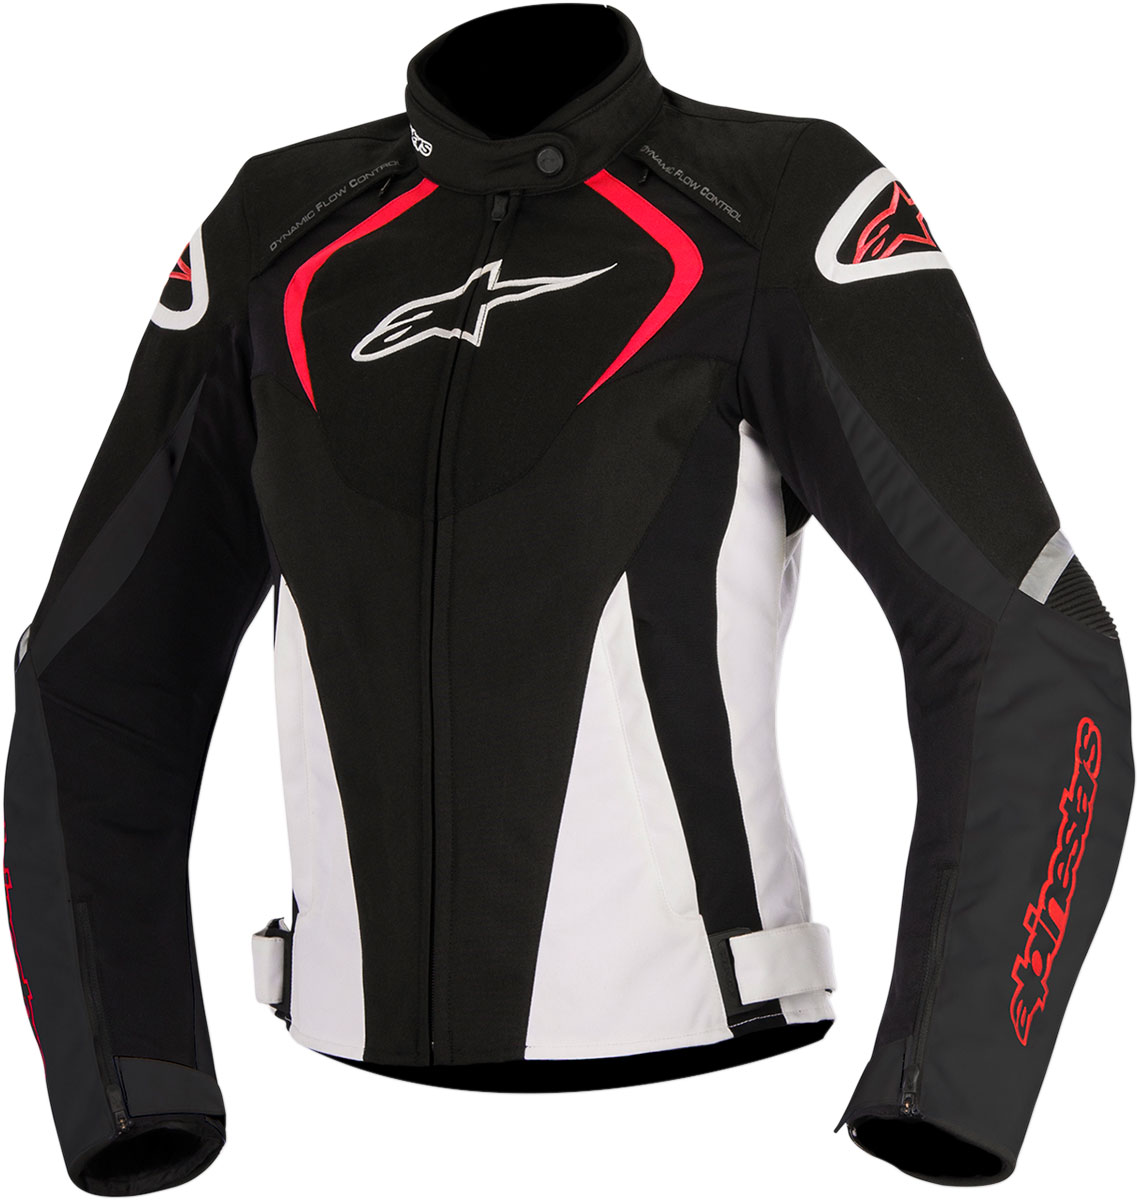 Alpinestars Stella T-JAWS Waterproof Textile Jacket (Black/White/Red)